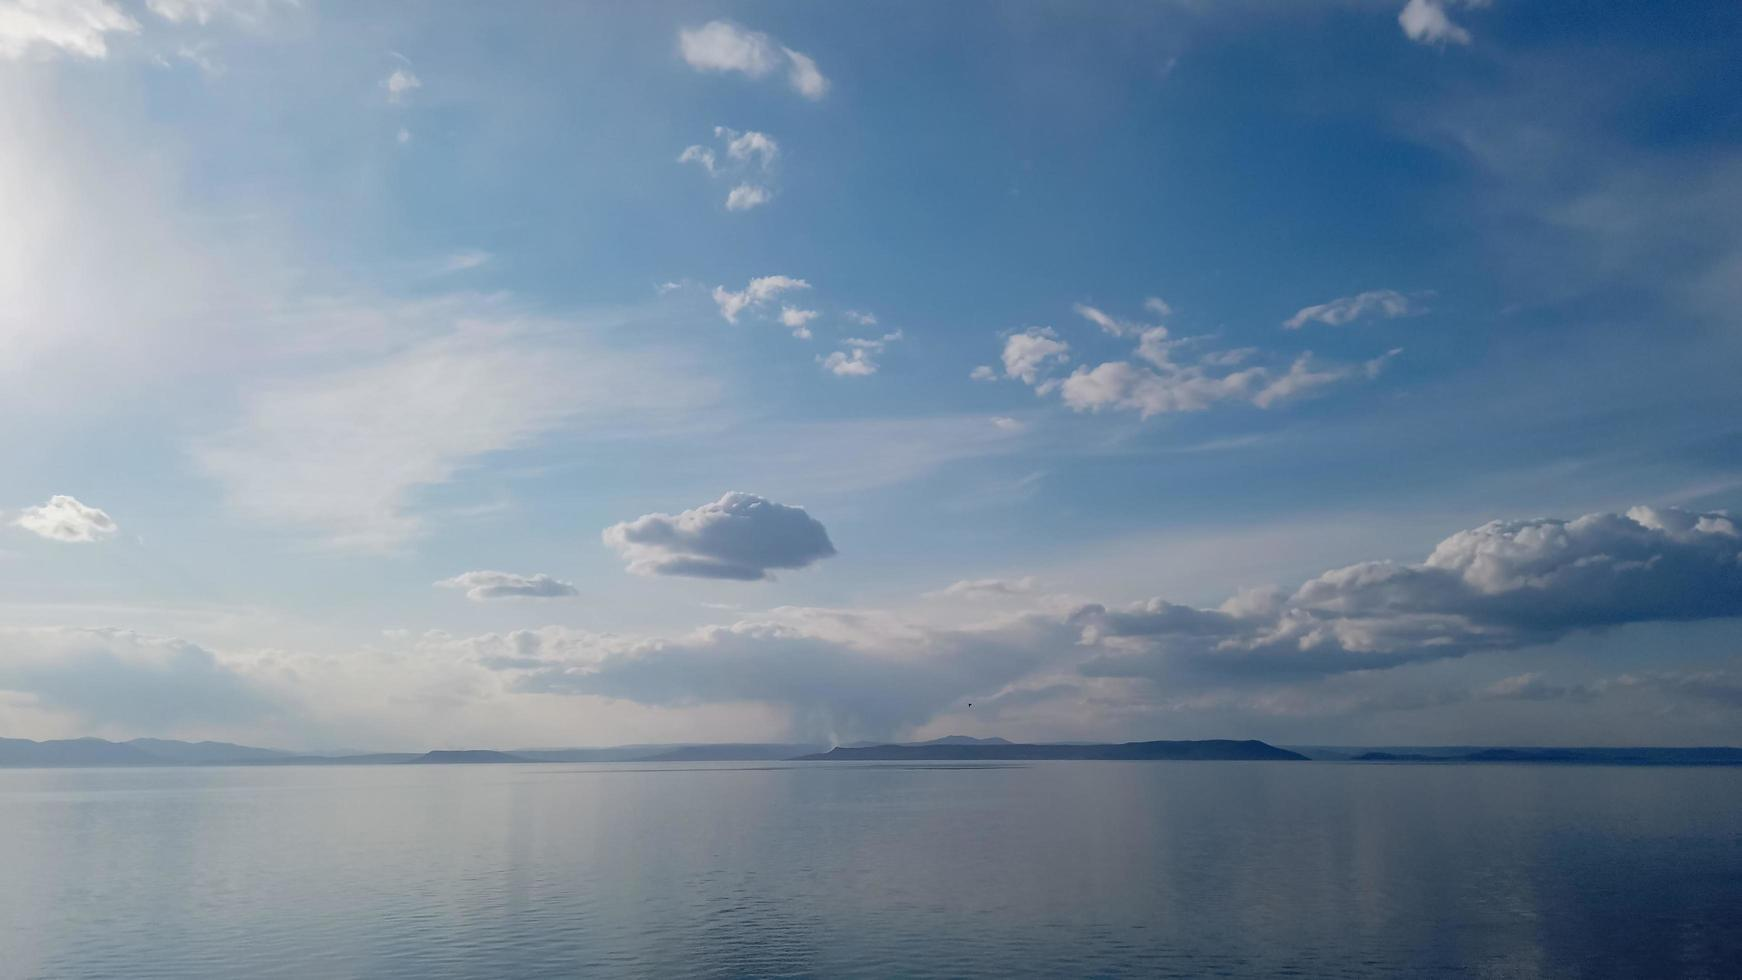 Seelandschaft des Gewässers mit bewölktem blauem Himmel foto